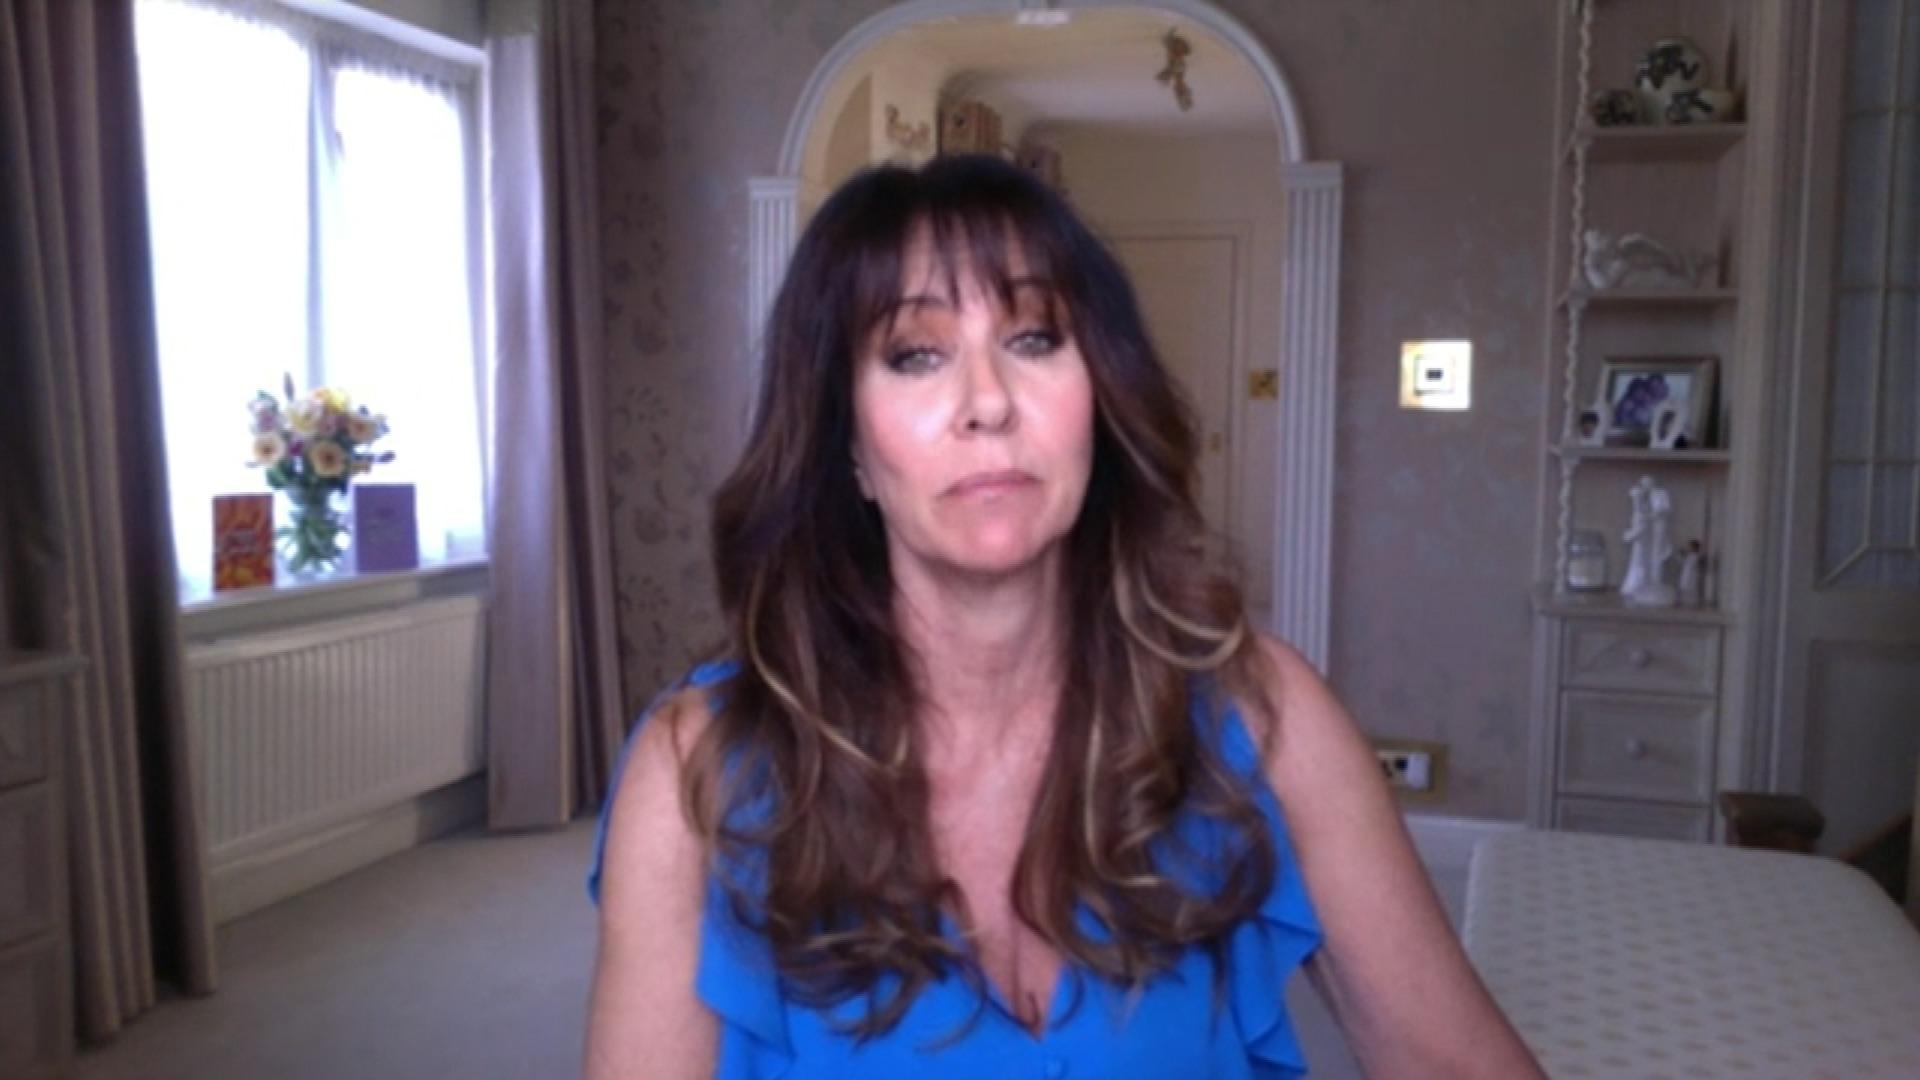 Linda Losardi feels much better after painful coronavirus battle